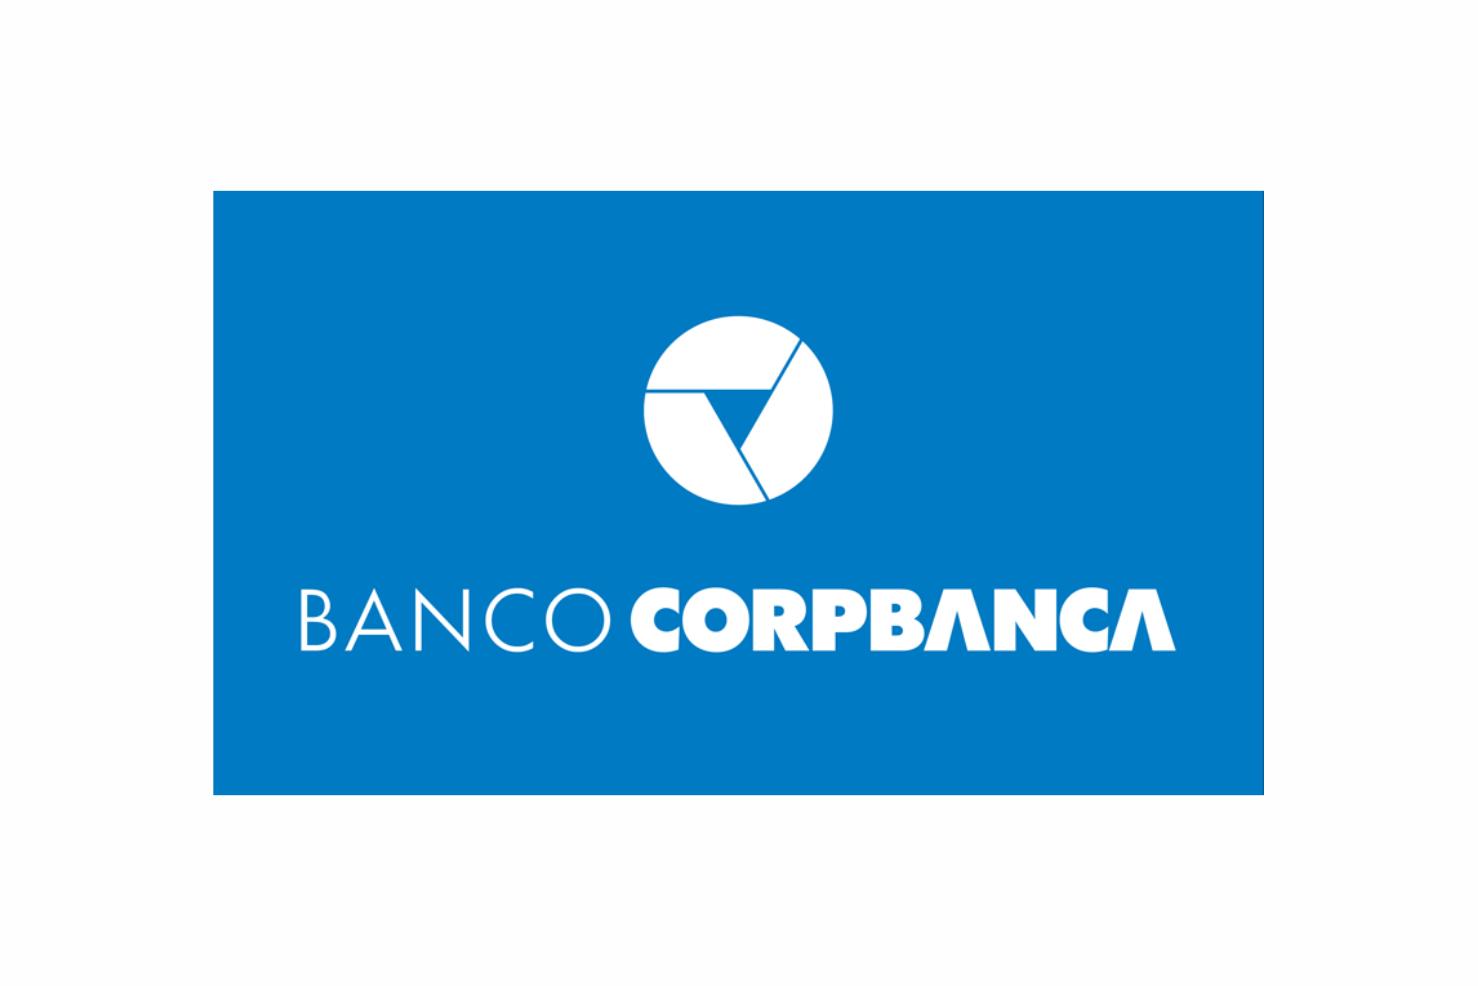 Banco Corpbanca logo